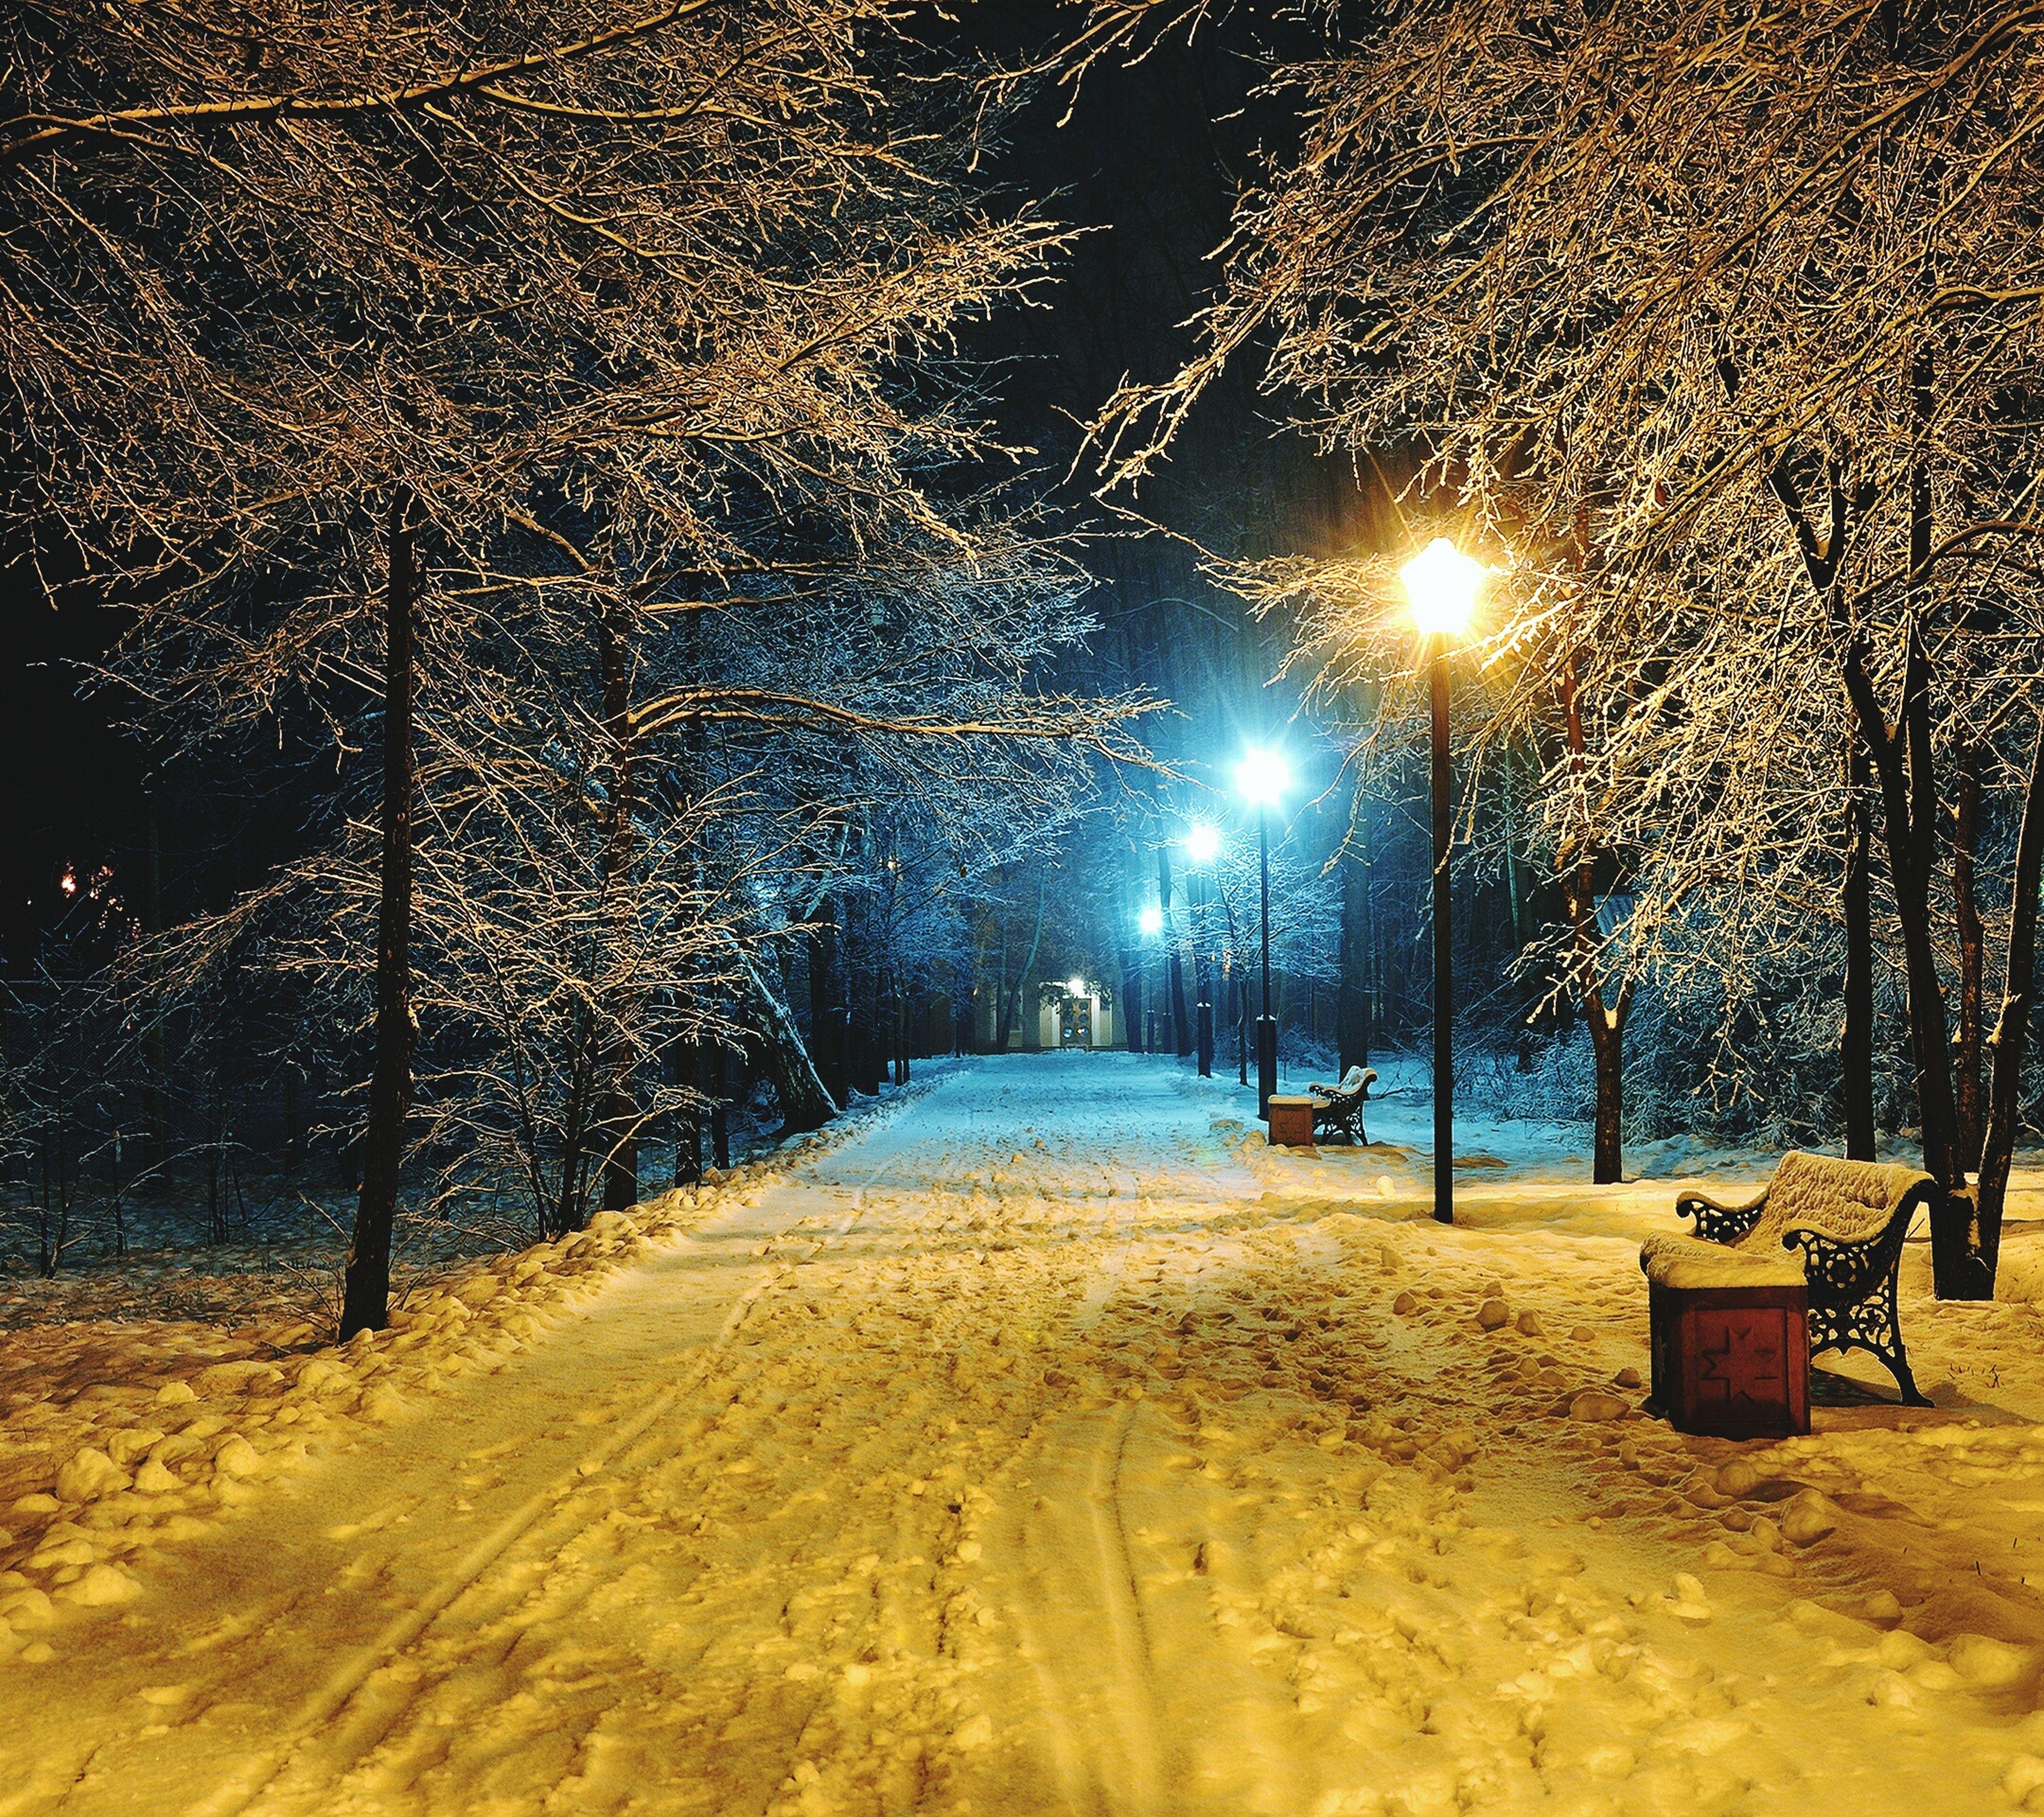 night, illuminated, season, street light, wet, snow, street, weather, the way forward, winter, lighting equipment, cold temperature, road, water, empty, rain, outdoors, tree, nature, absence